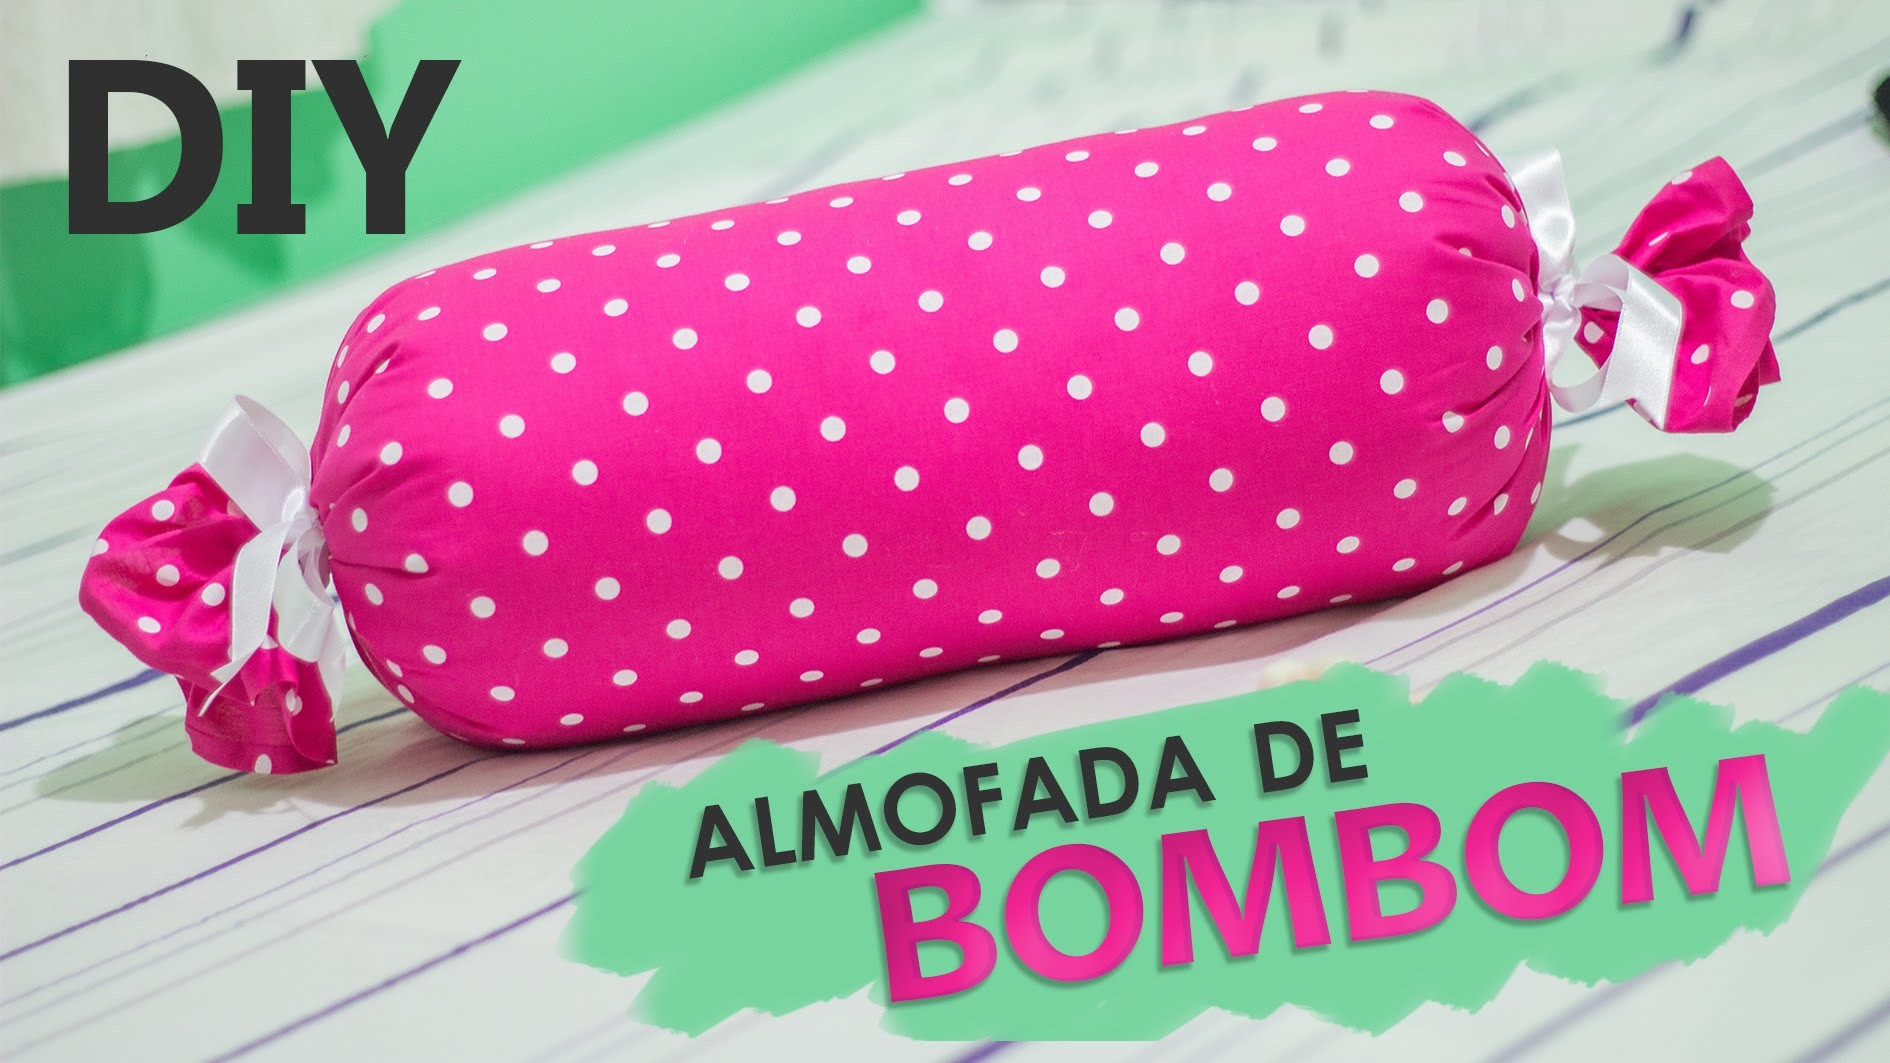 Desafio Méliuz | DIY almofada de bombom sem costura